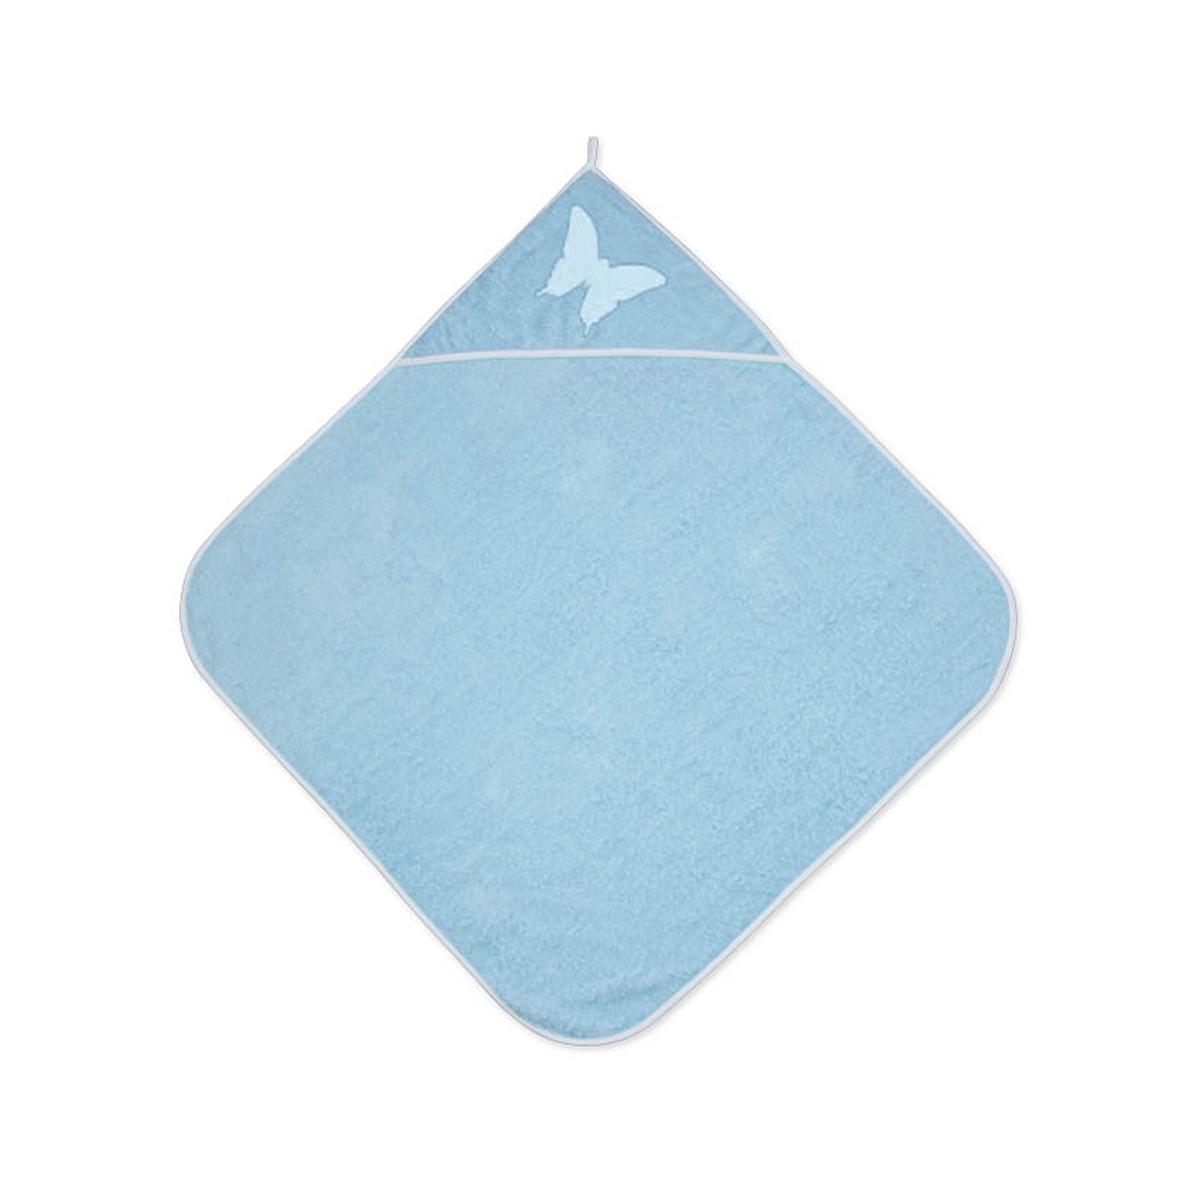 Prosop Lorelli Classic 80x80 cm - Bleu